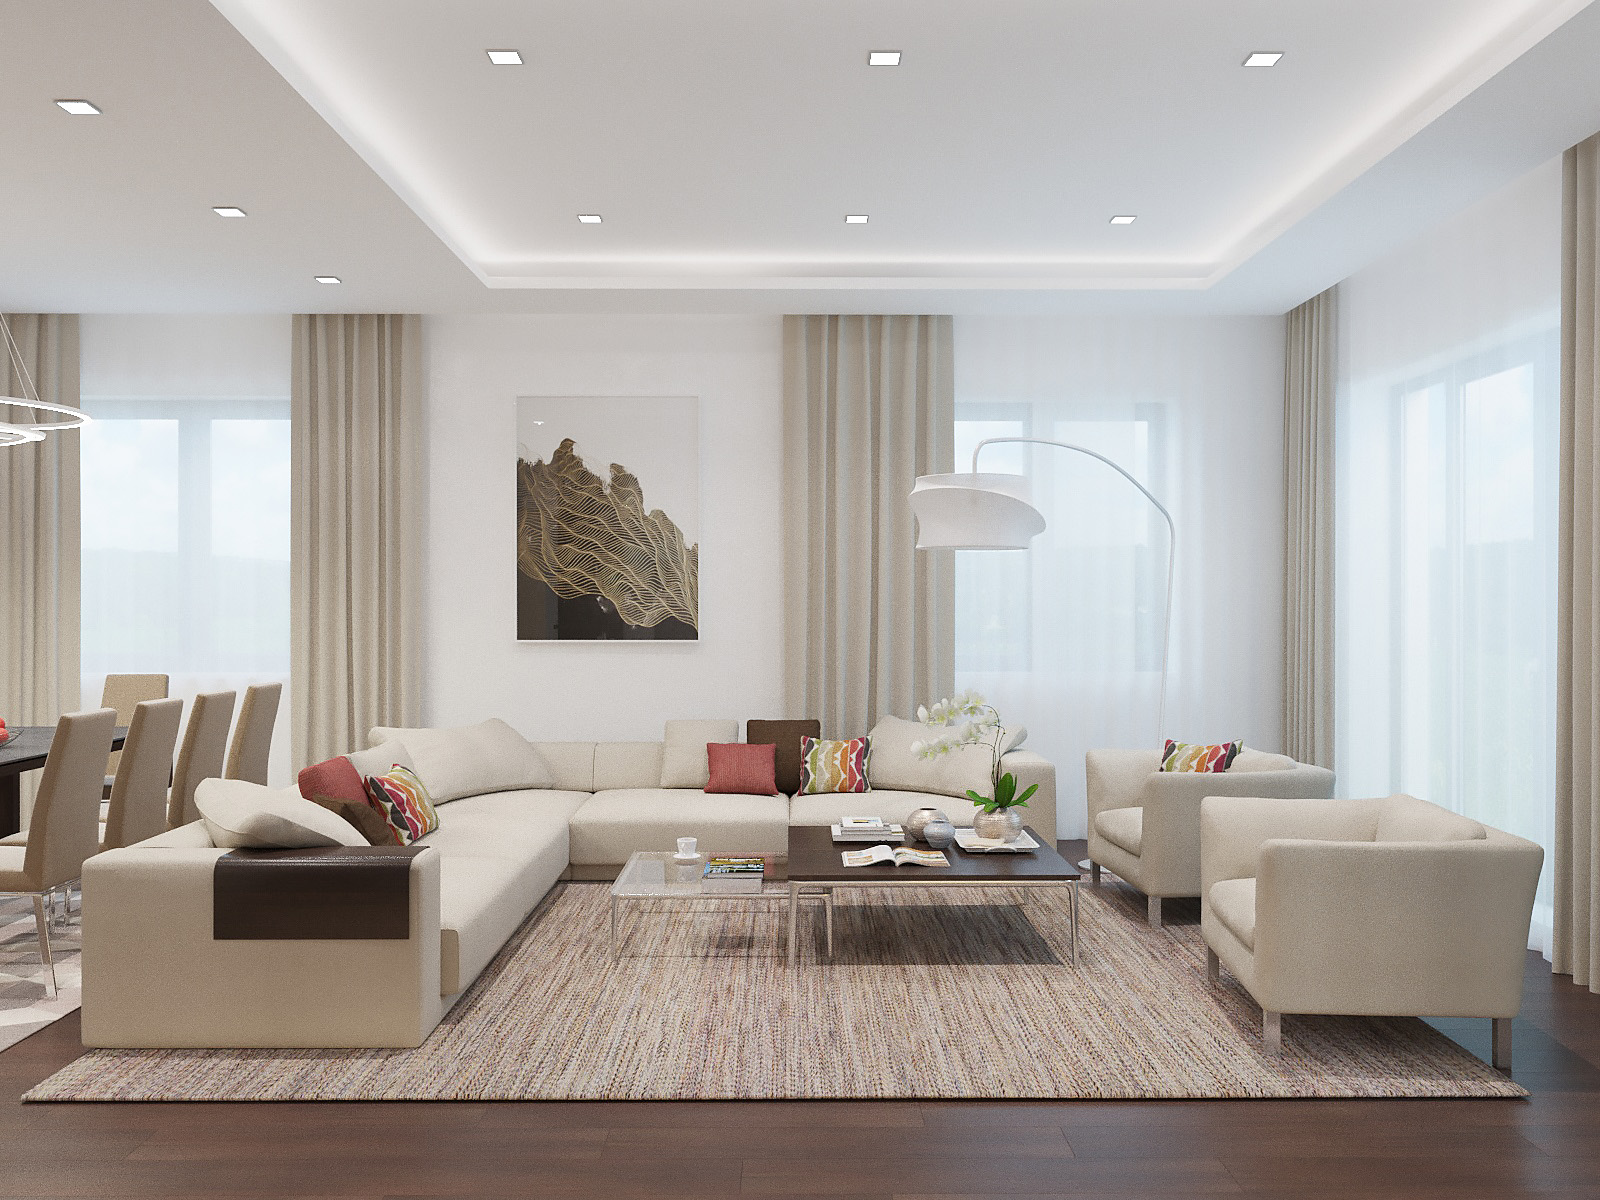 home interior modern decorate